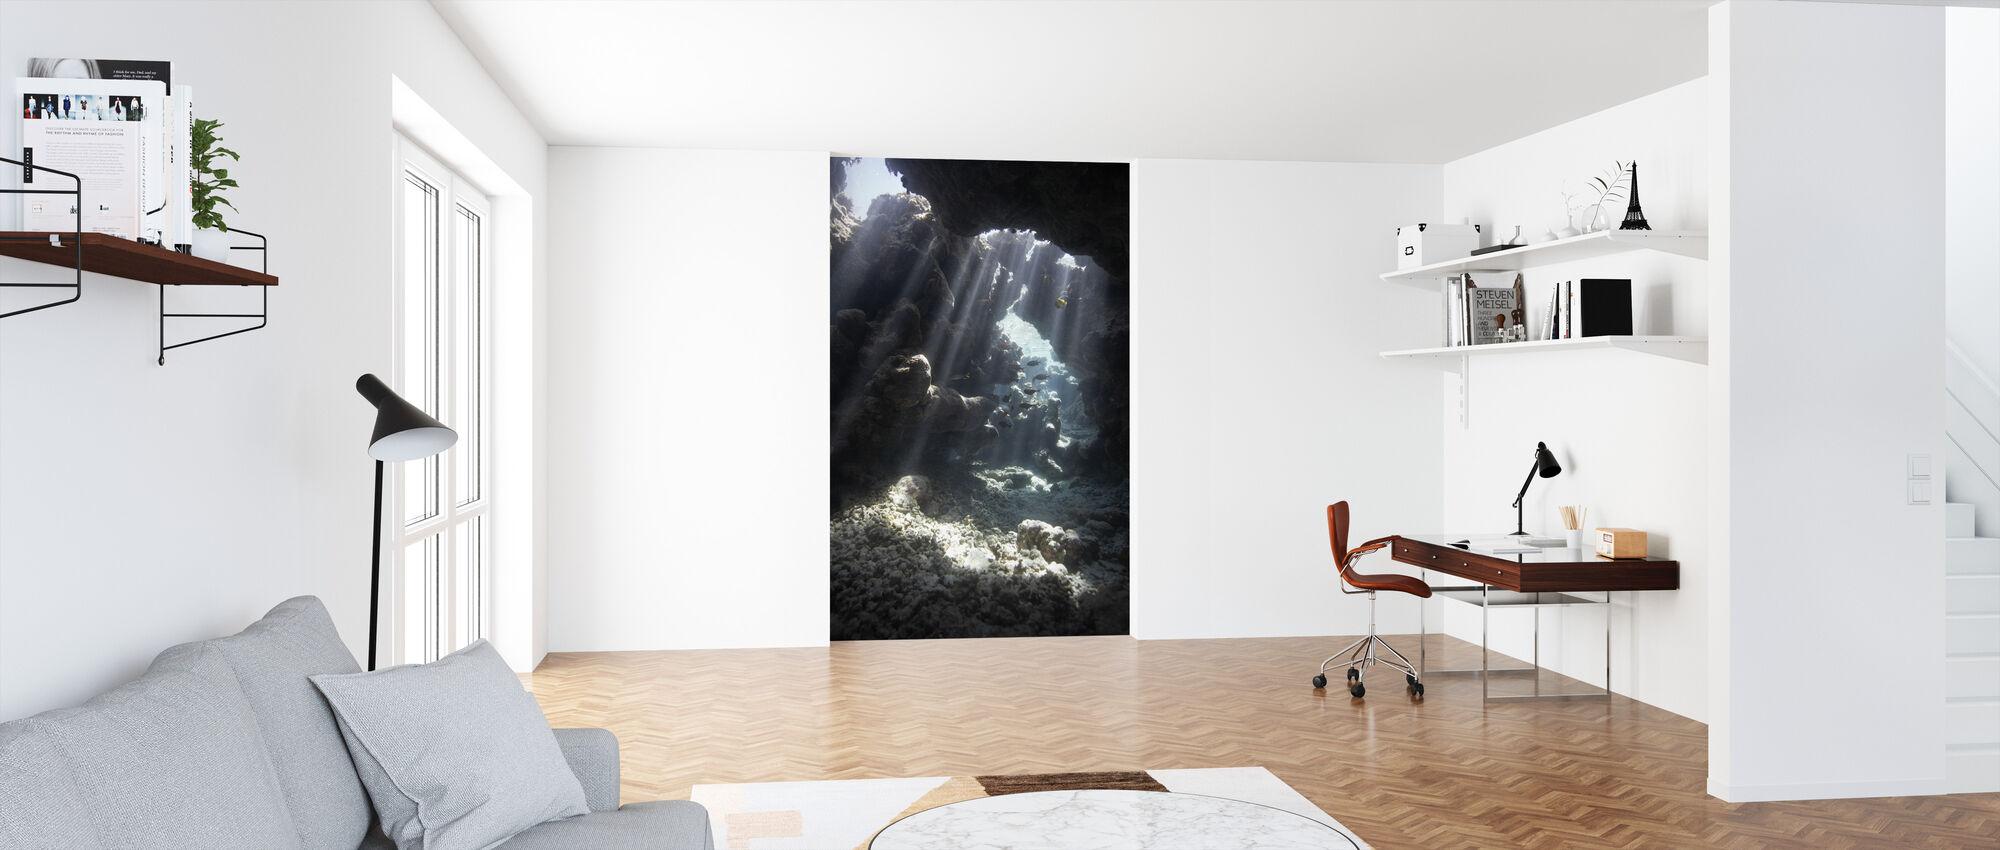 Sunbeams through Water - Wallpaper - Office